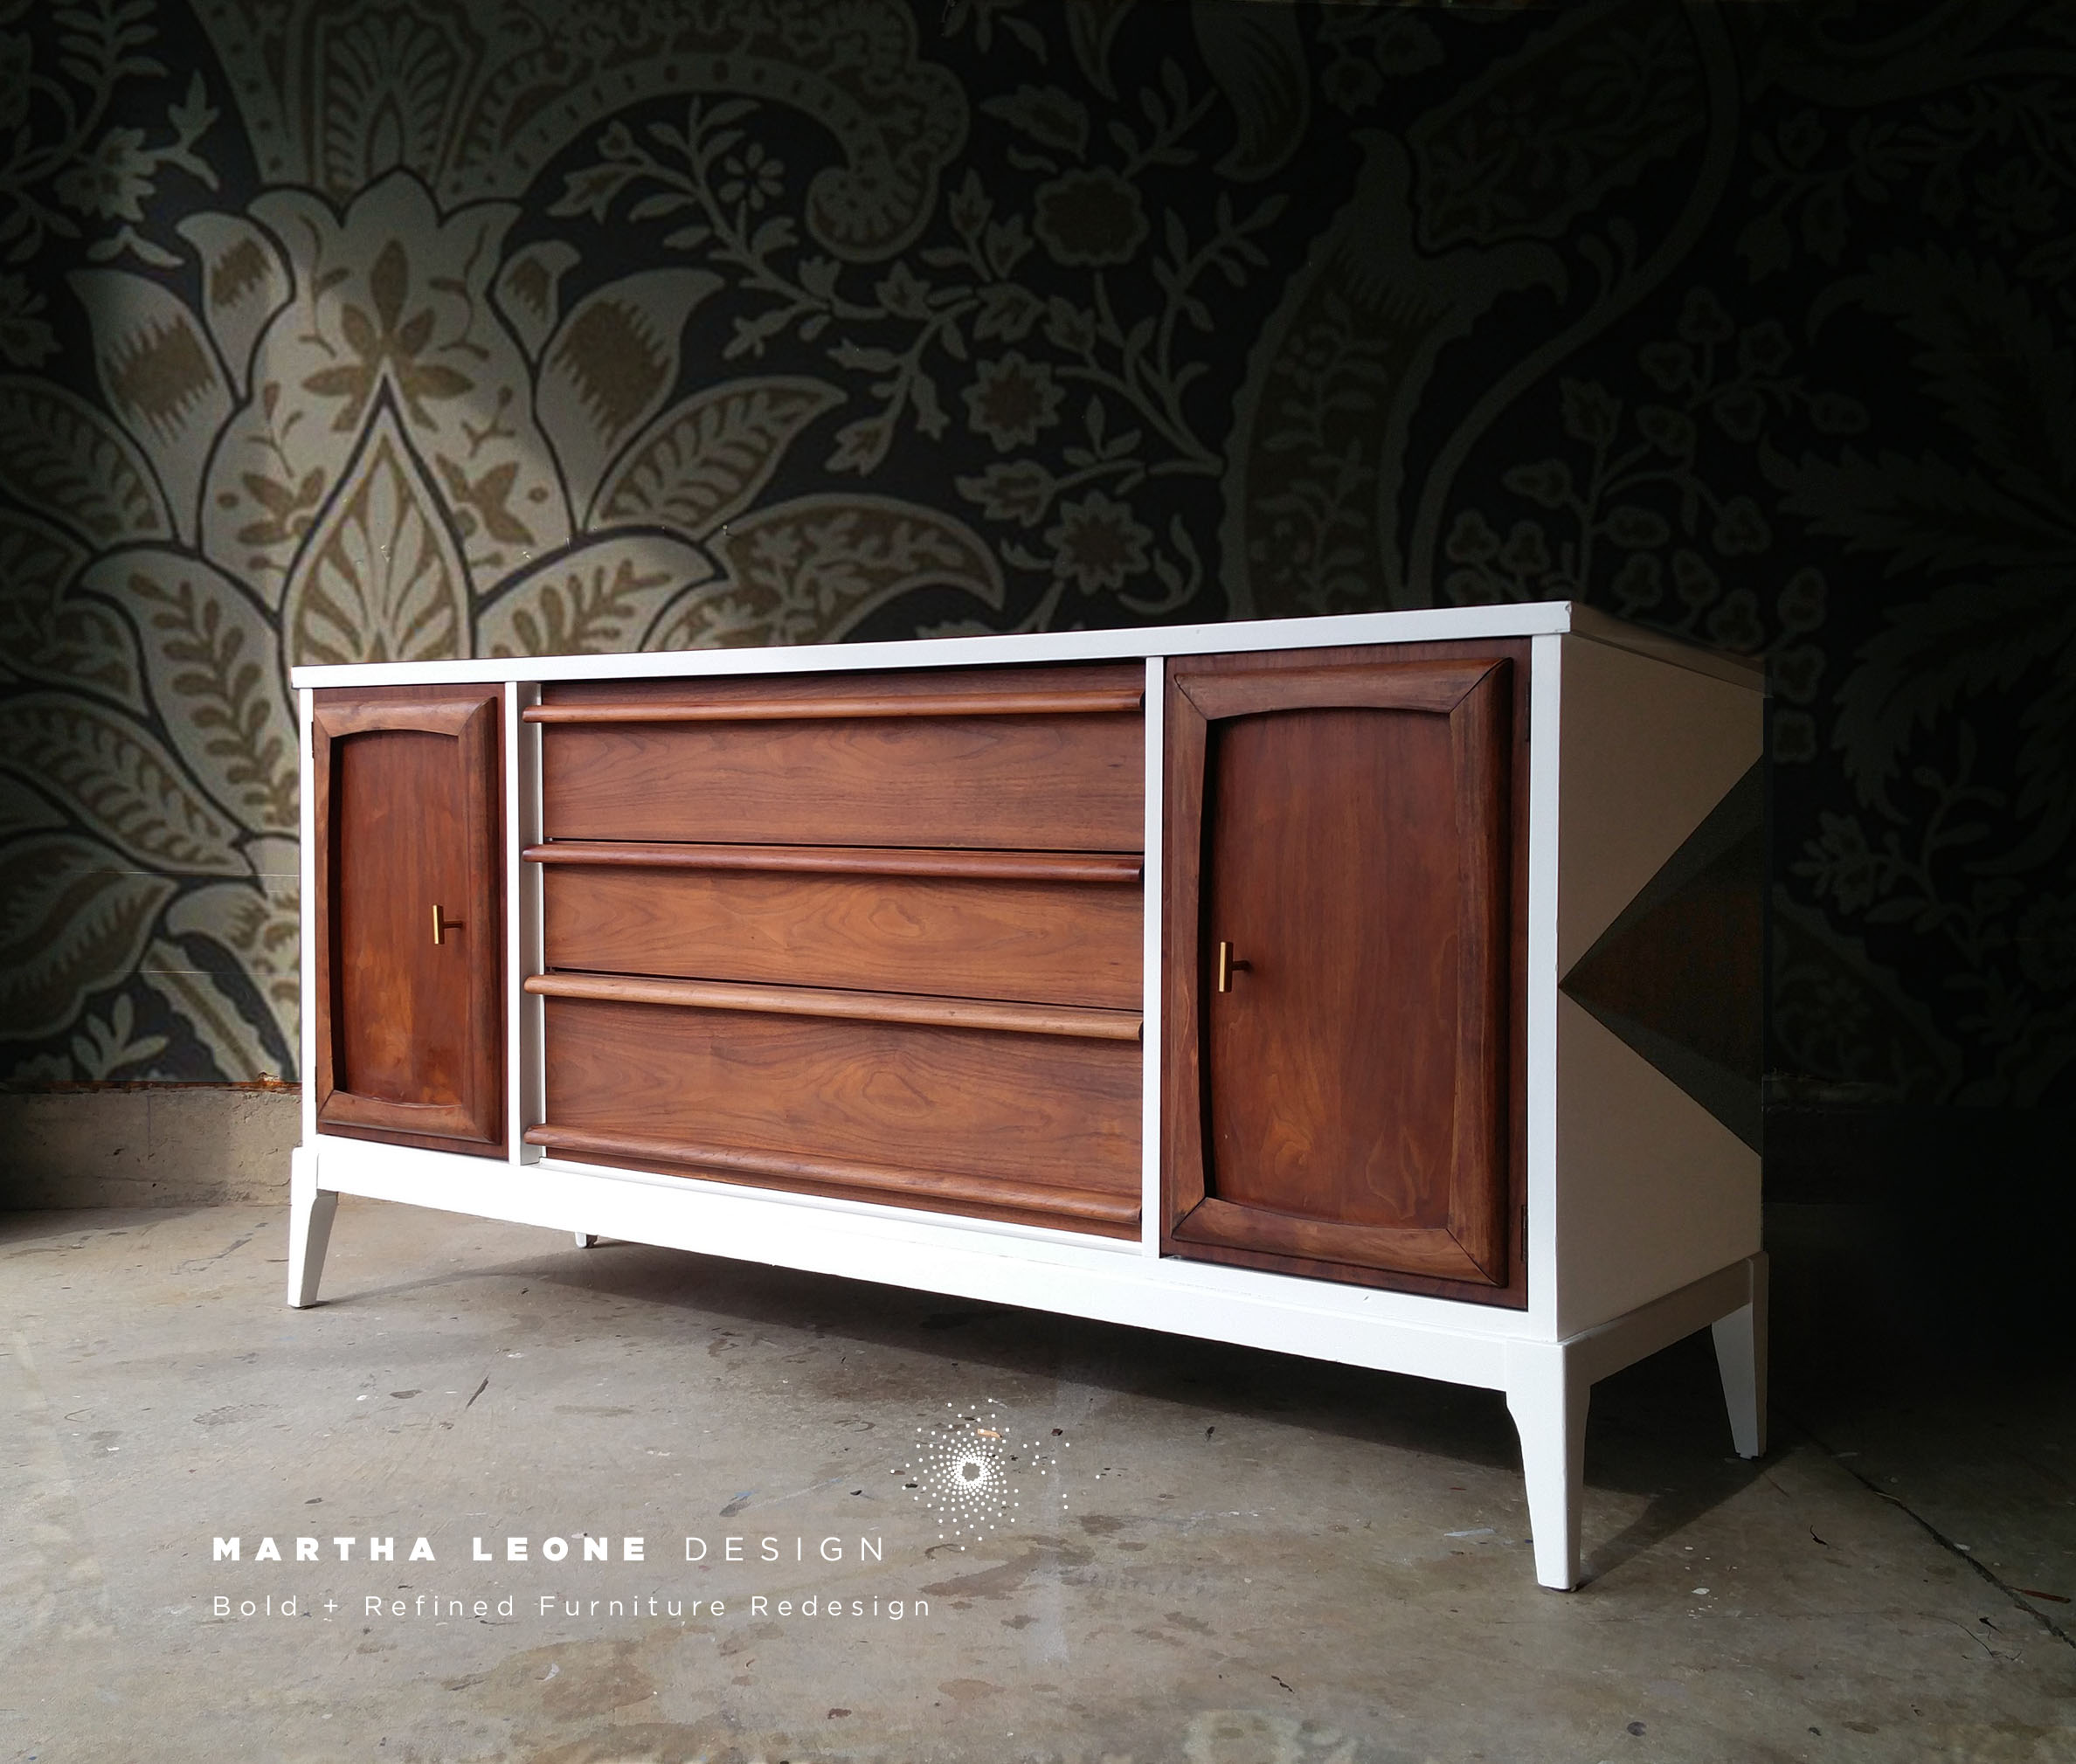 430 Martha Leone Design.jpg